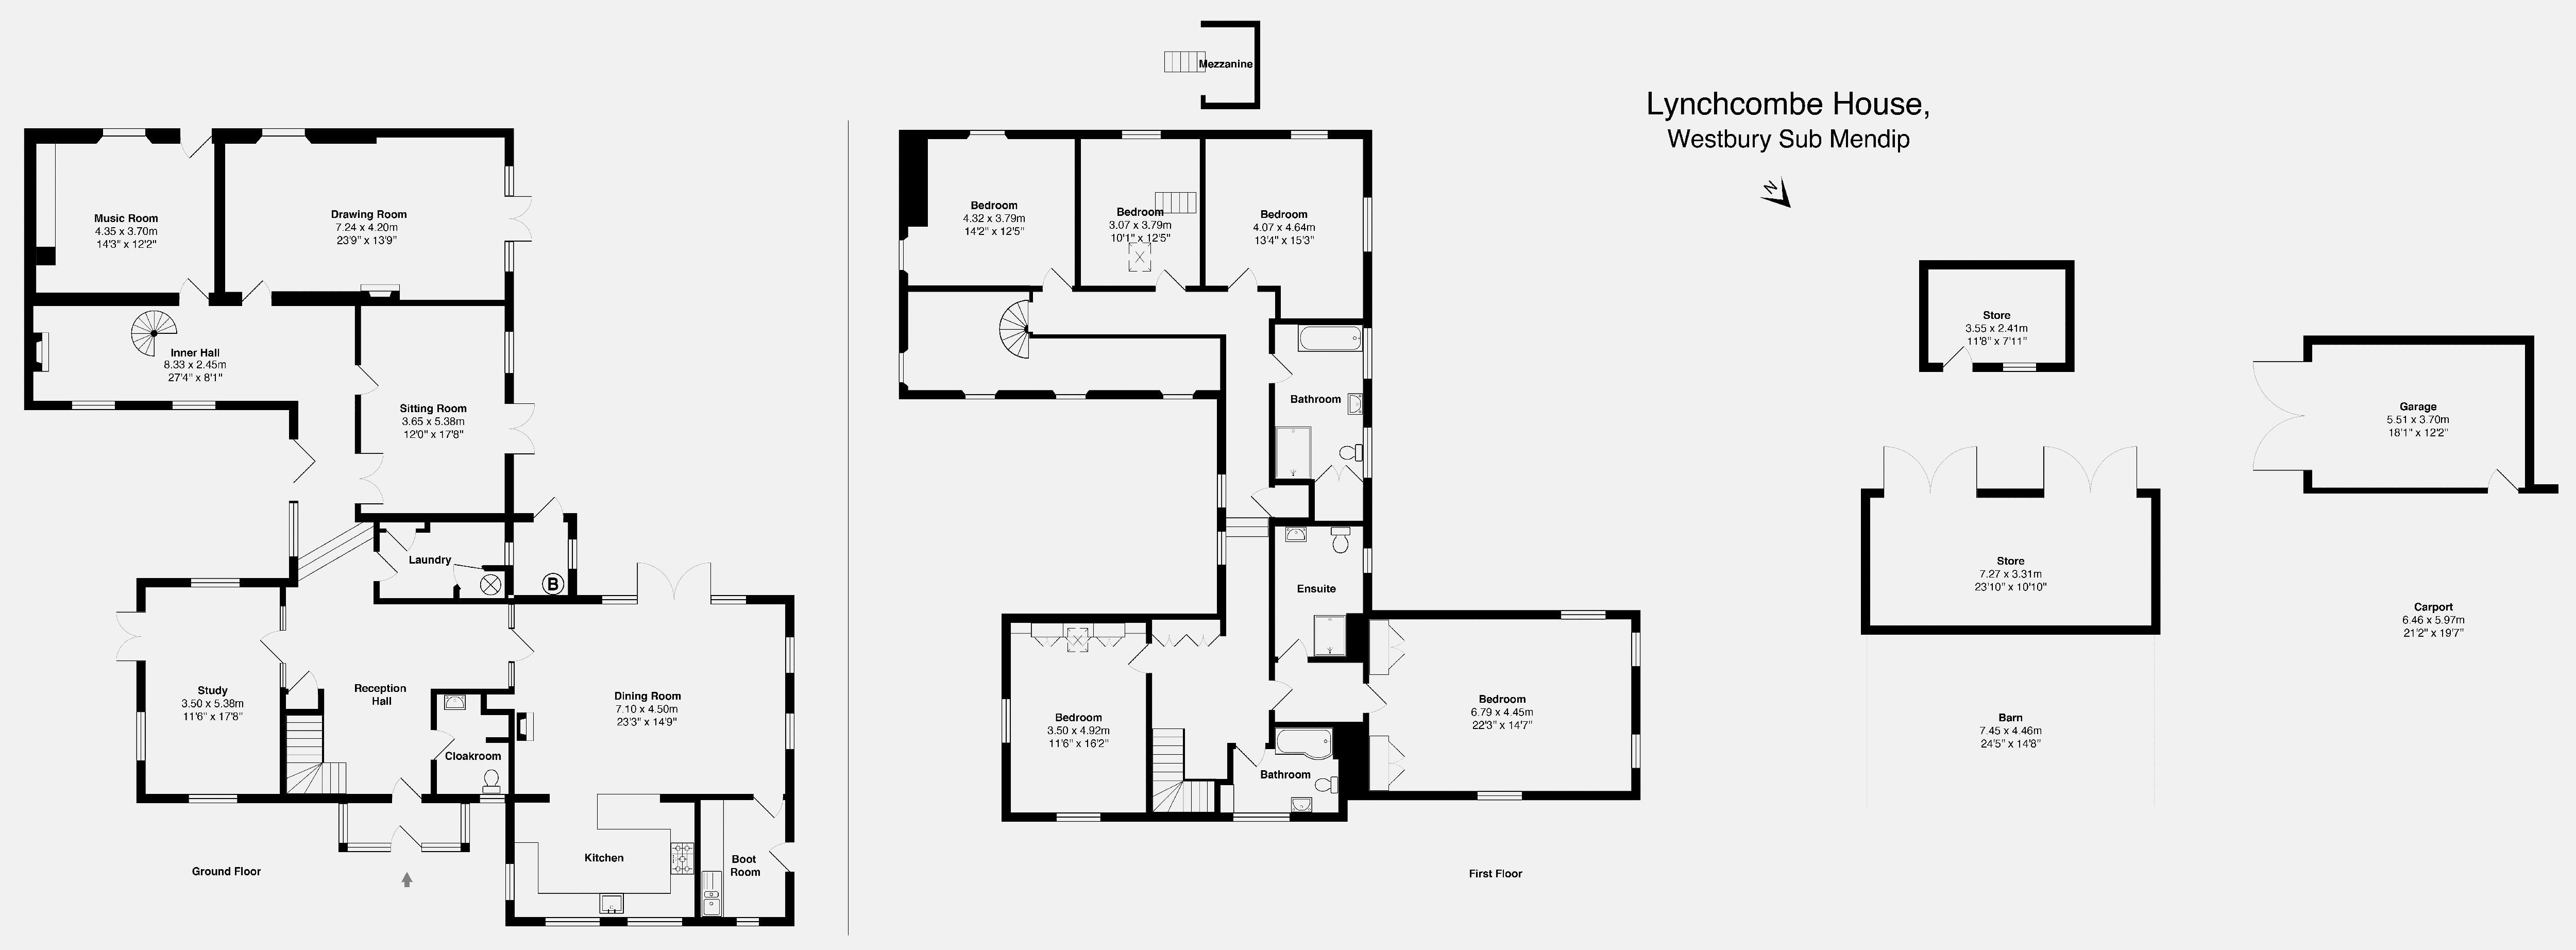 Lynchcombe Lane Westbury Sub Mendip